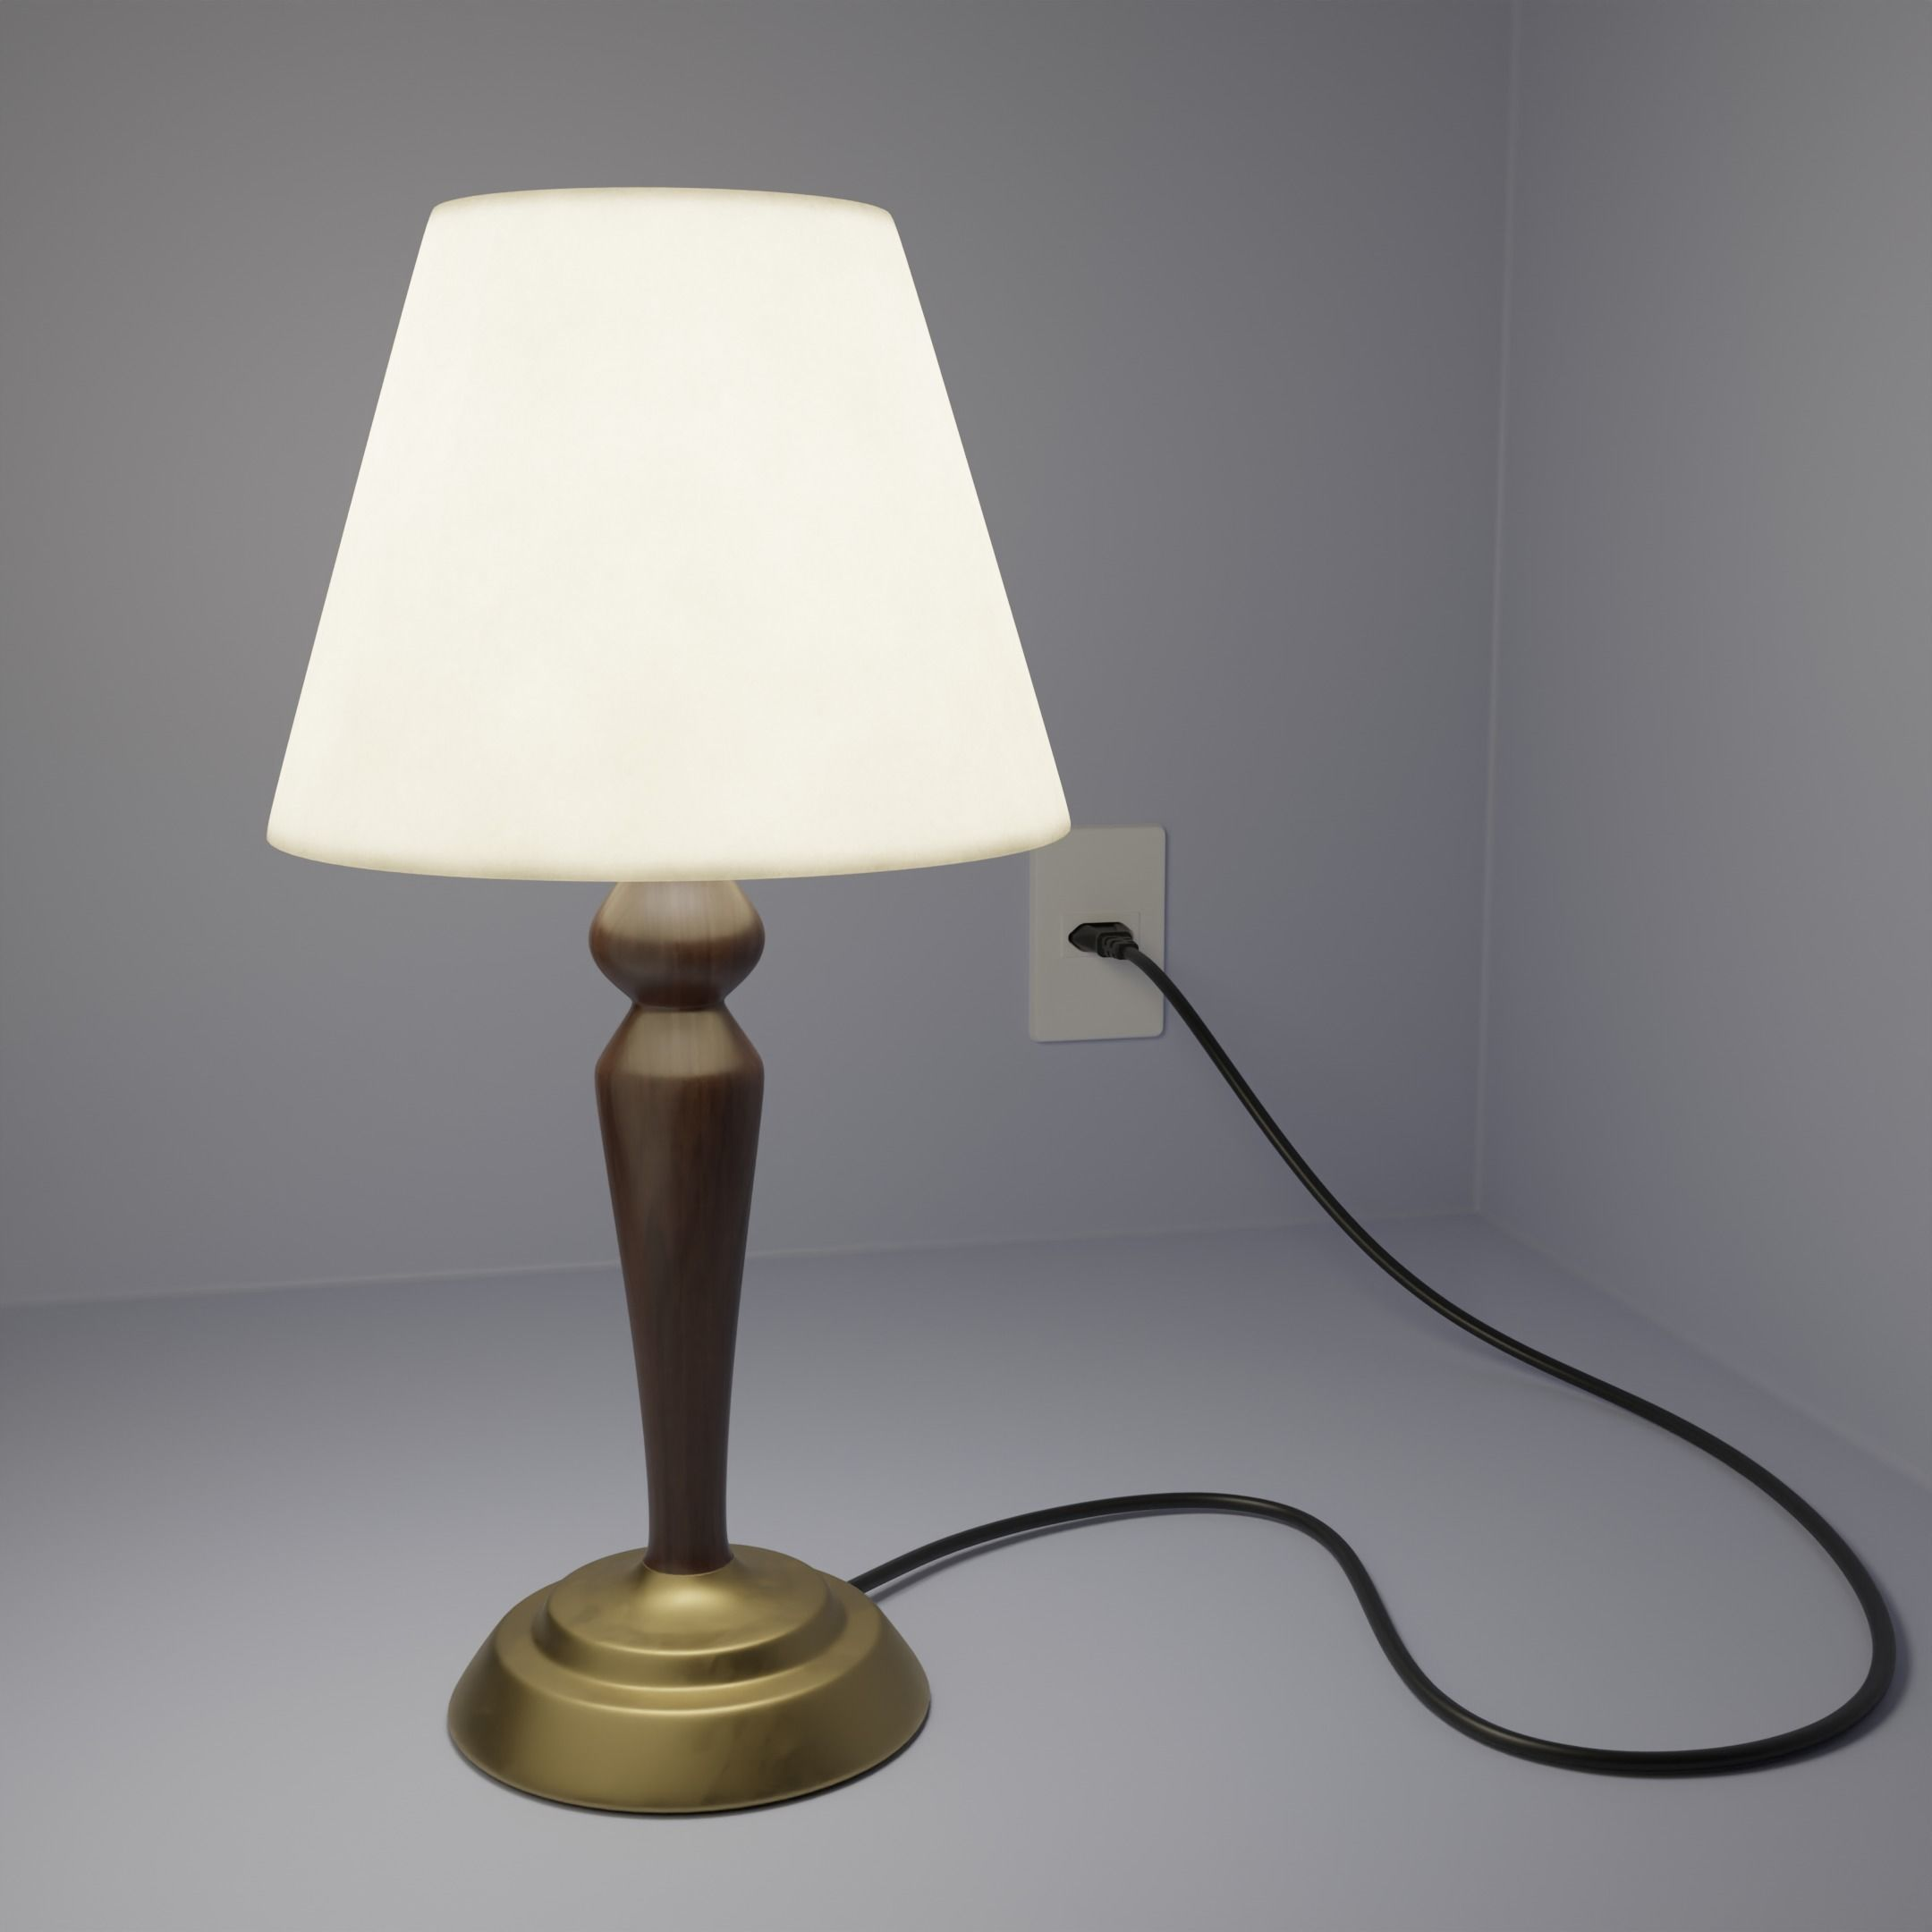 Lamp - Bedside lamp